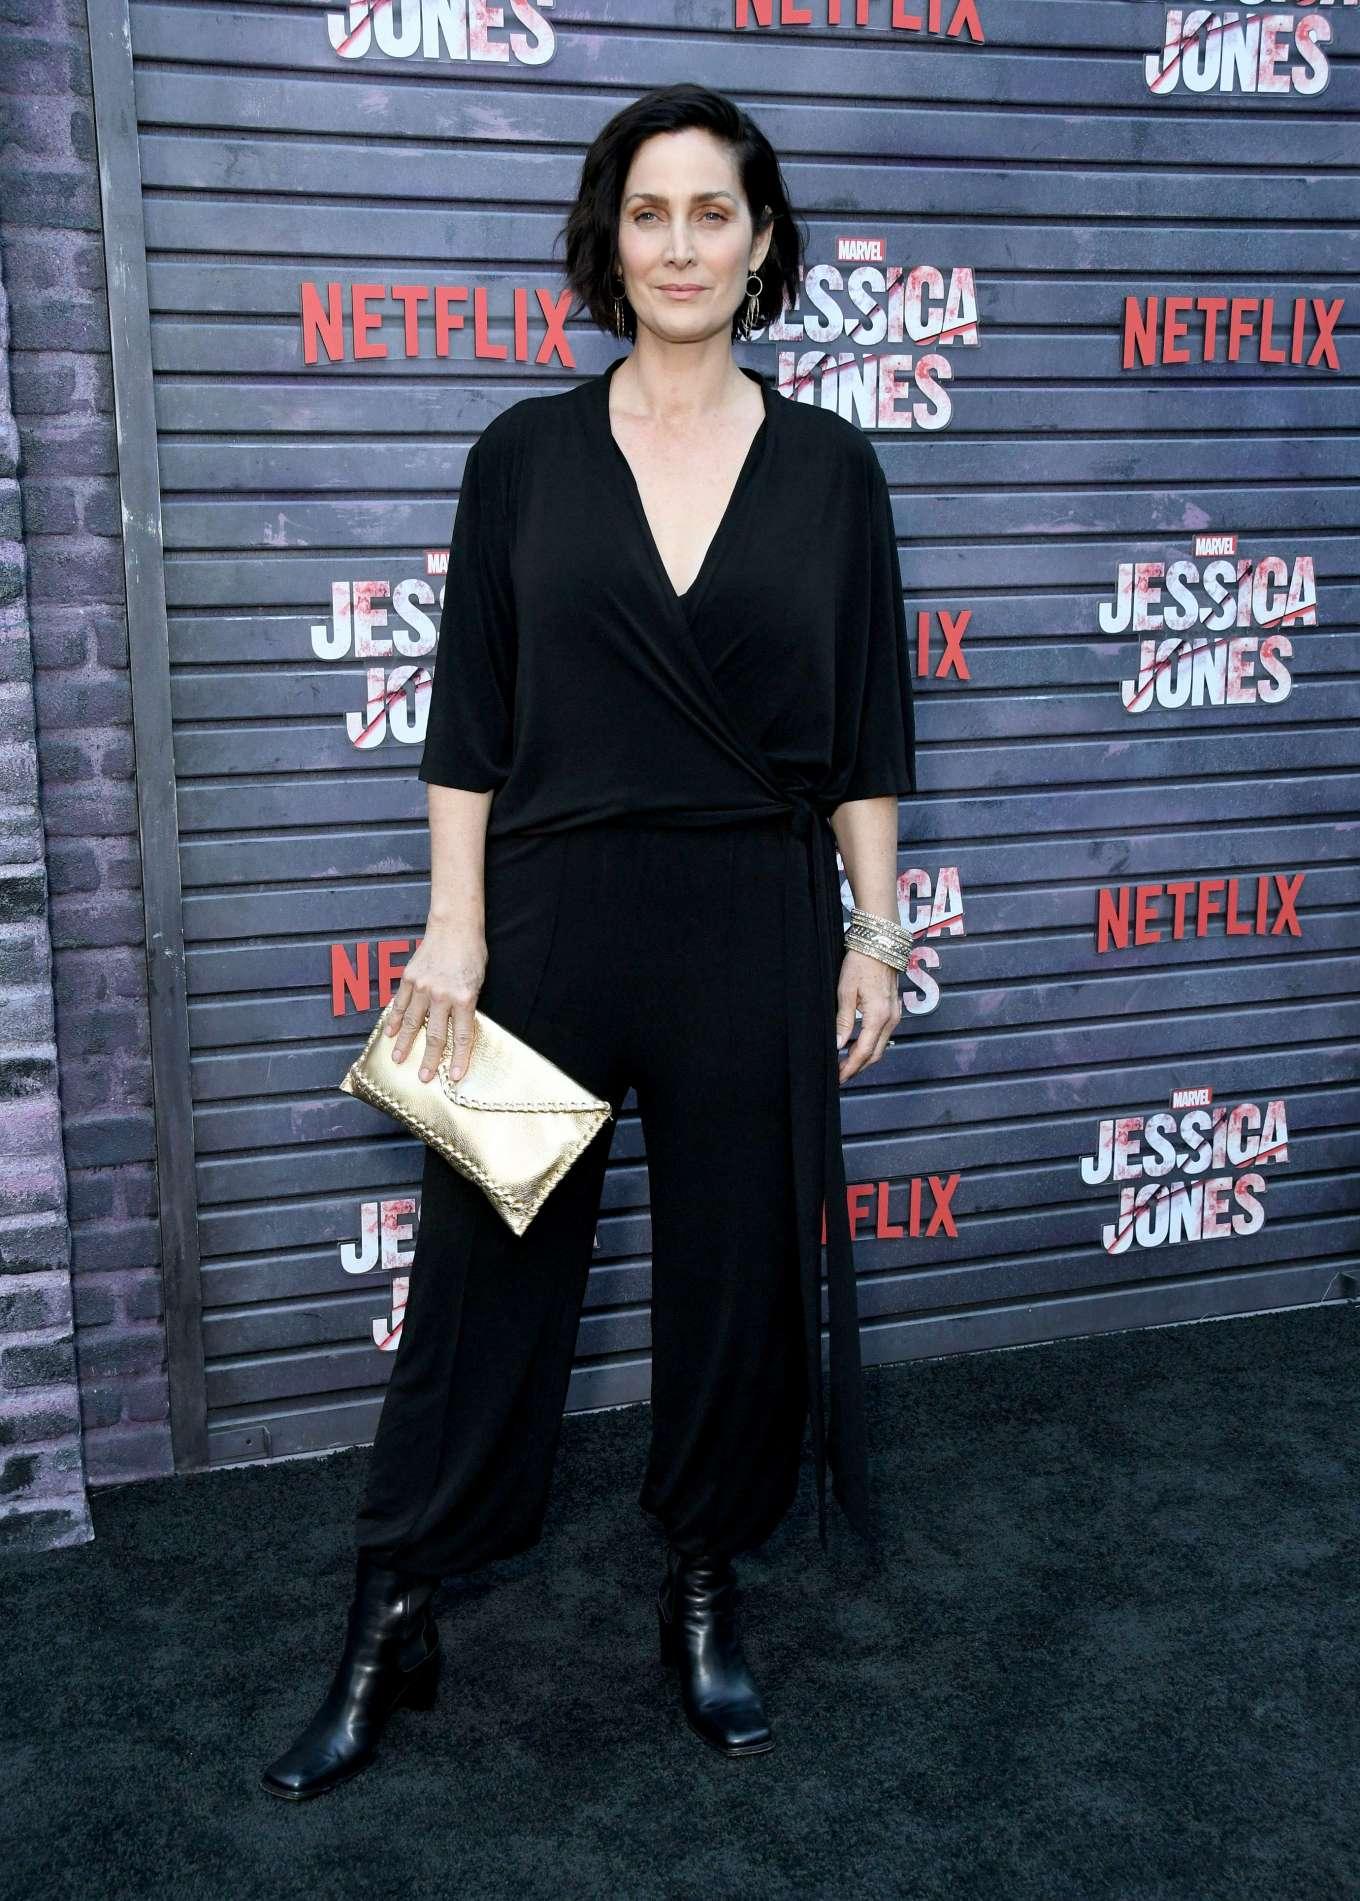 Carrie-Anne Moss - 'Jessica Jones' Season 3 Screening in Los Angeles